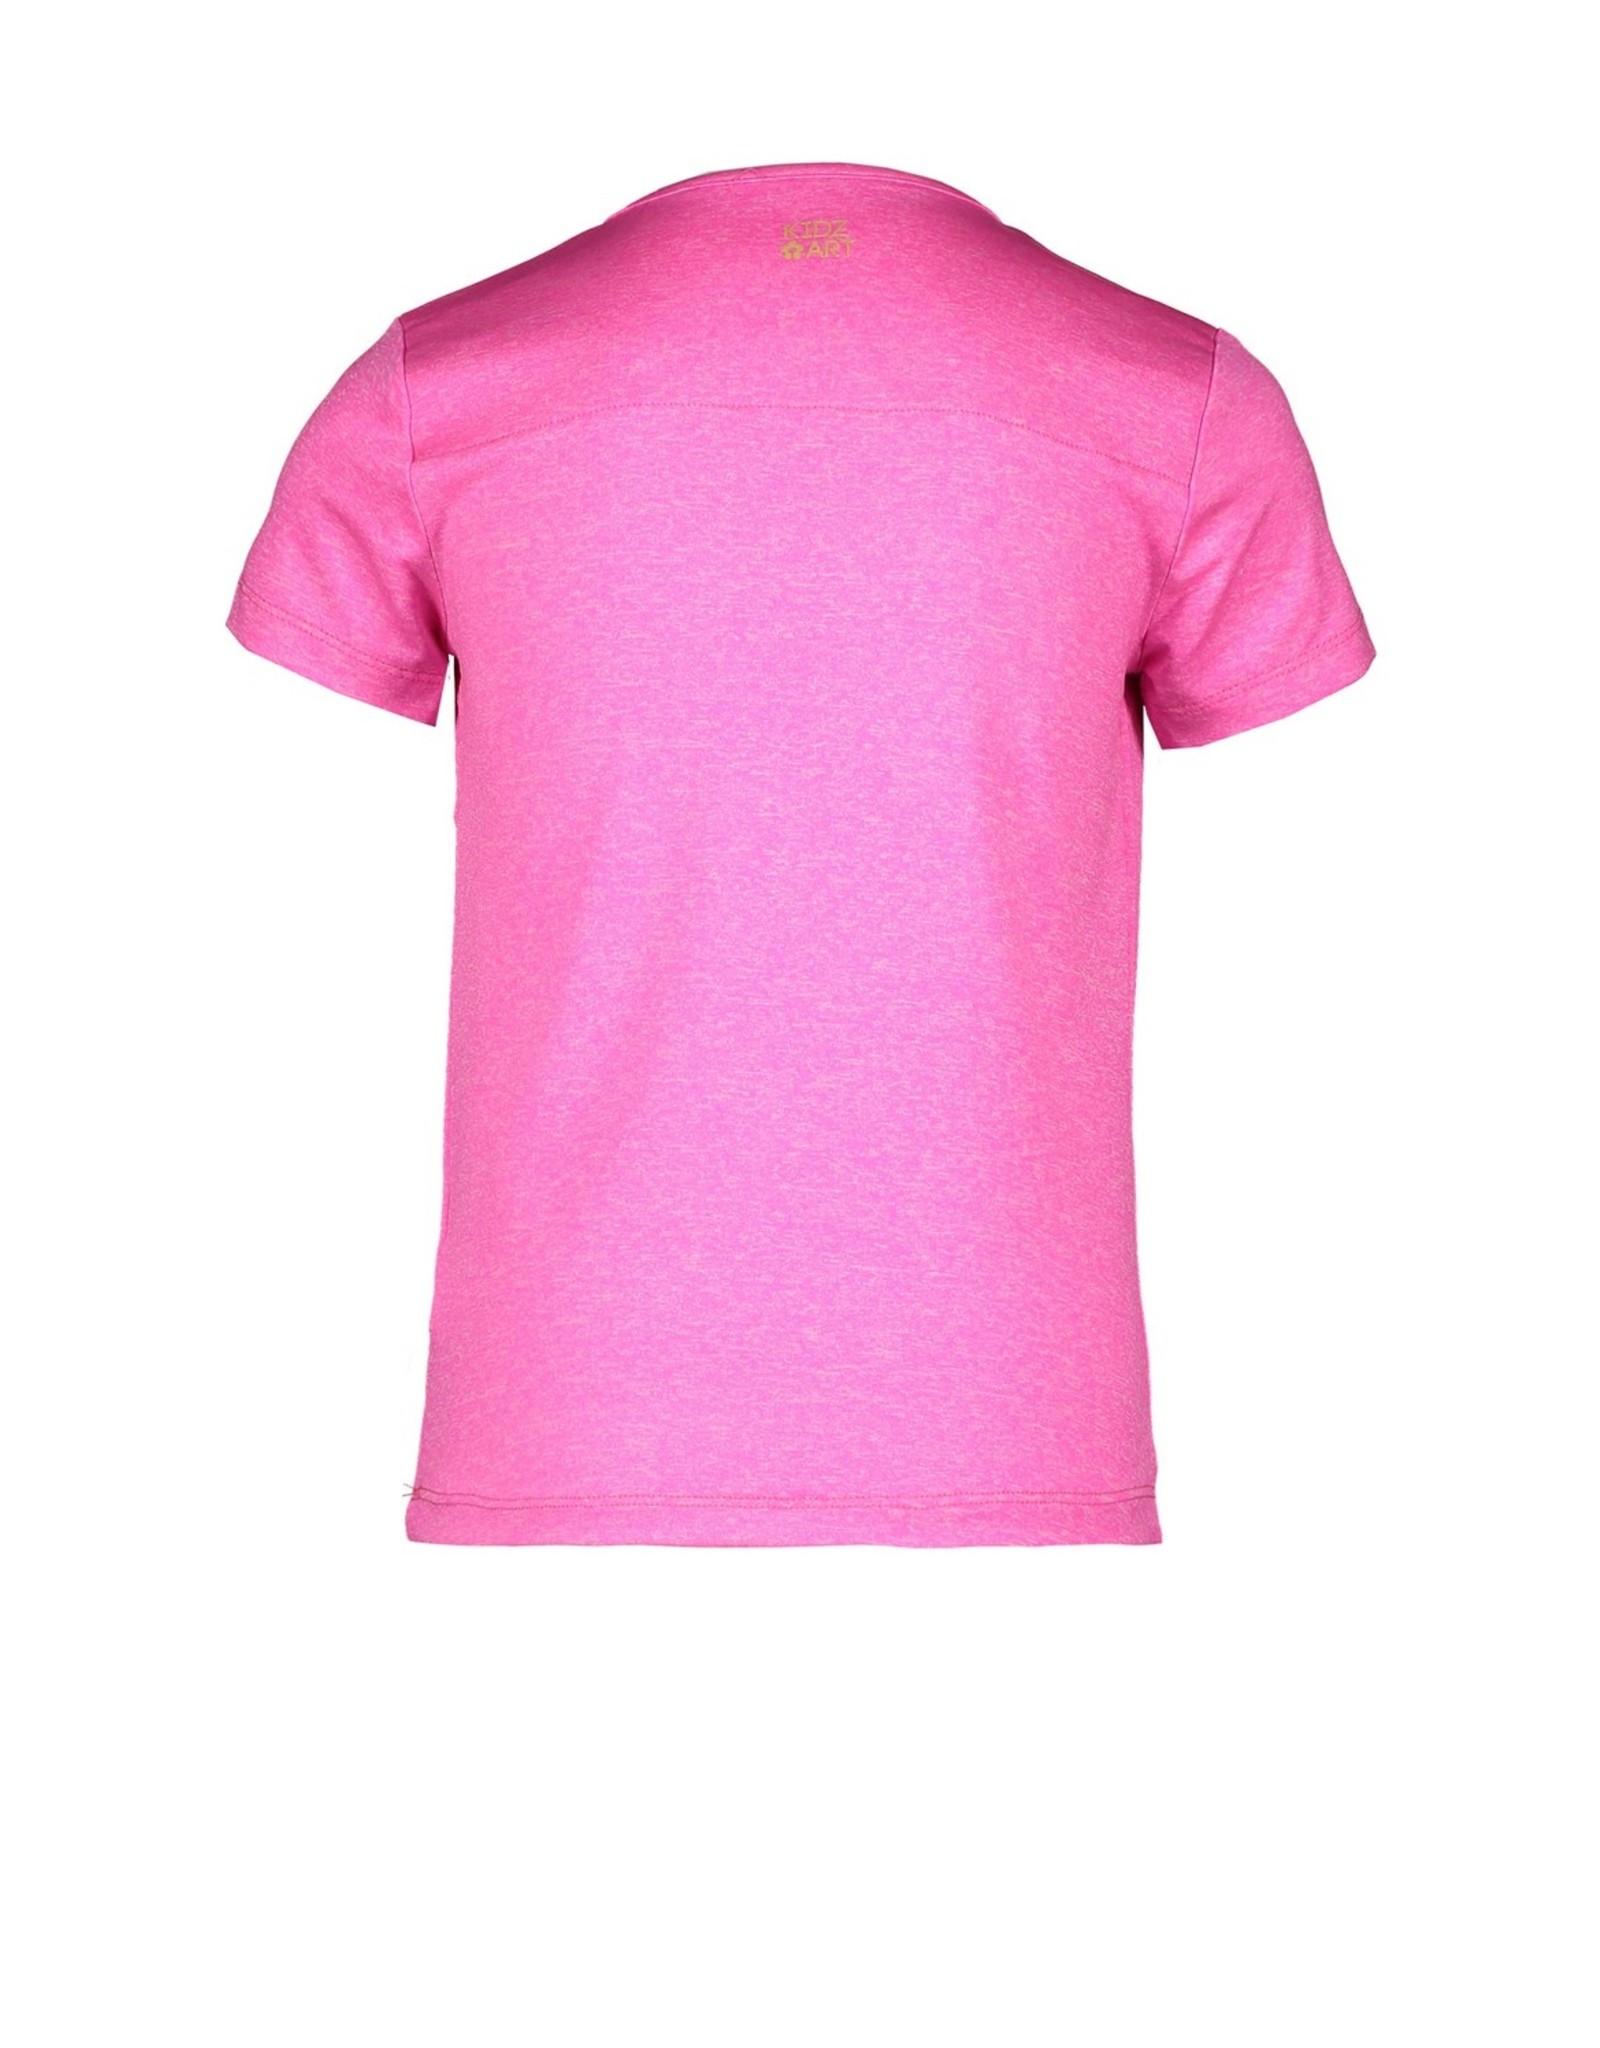 Kidz-Art T-shirt grindle melange s/s + tassels SUMMER